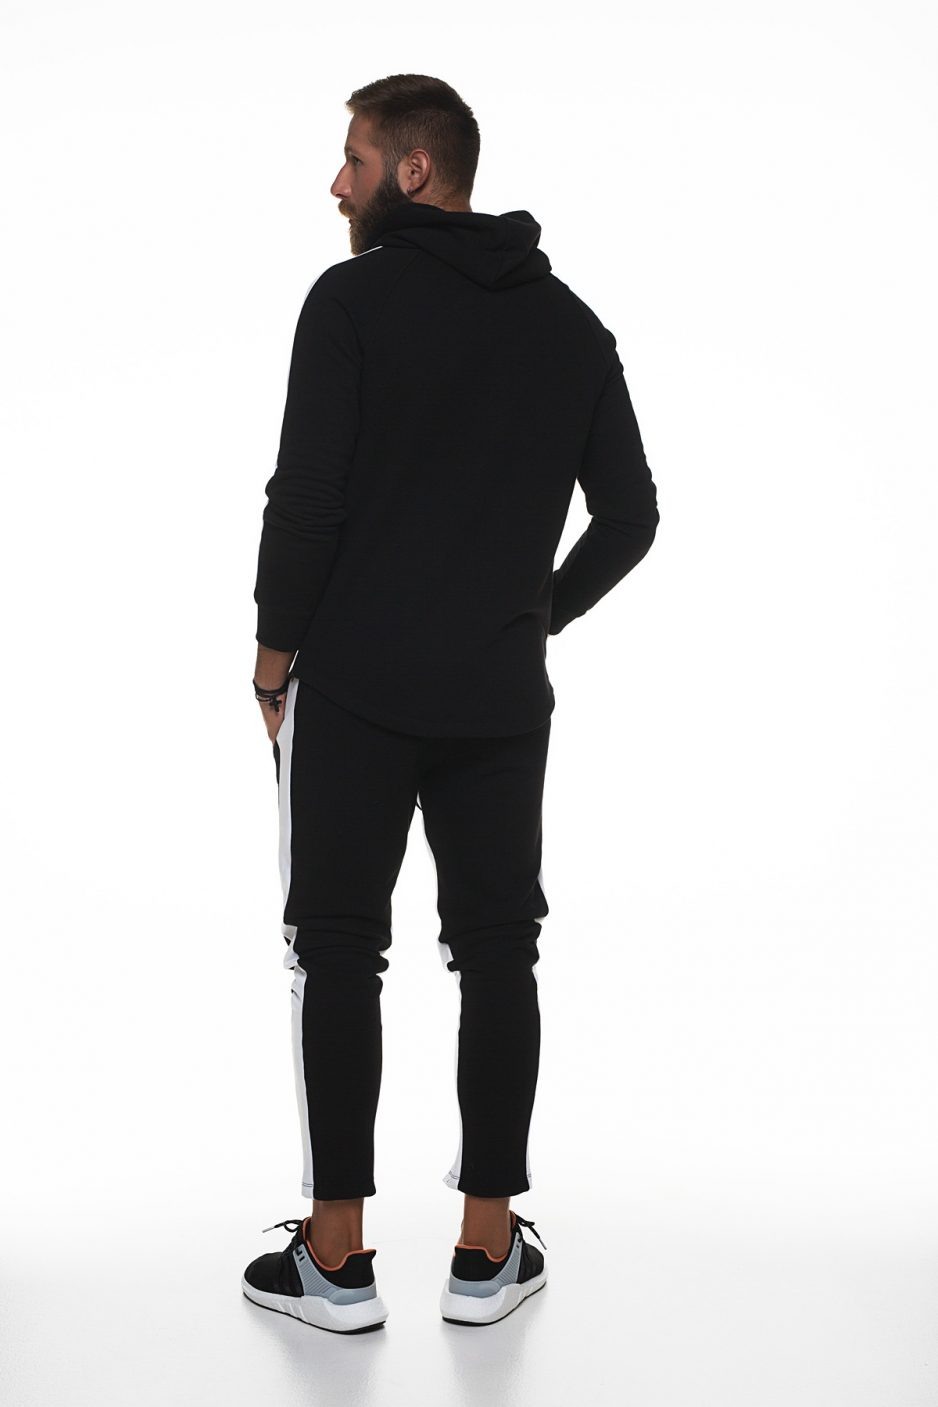 Black hoodies with white stripes on sleeves